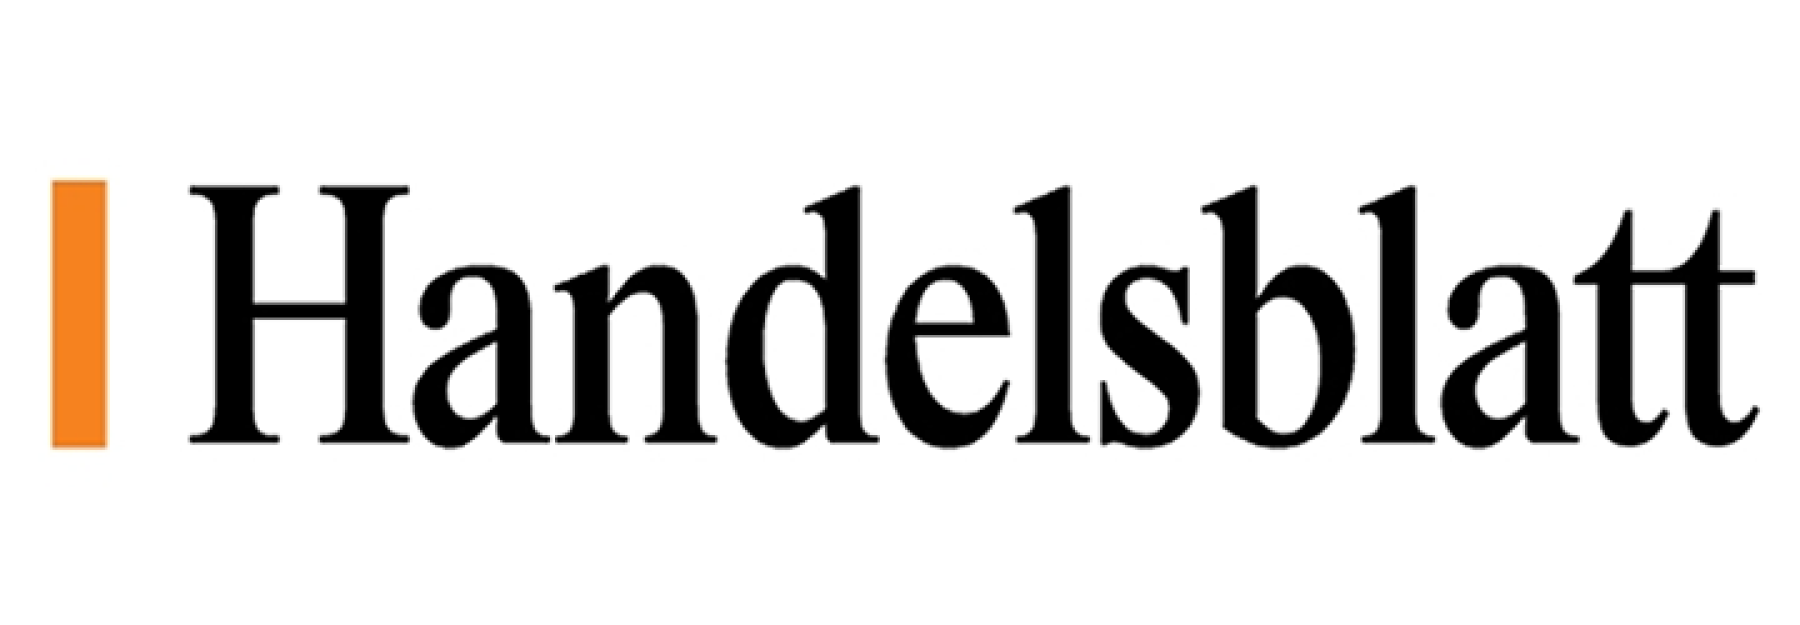 resize_1800x1200_handelsblatt-logo-01